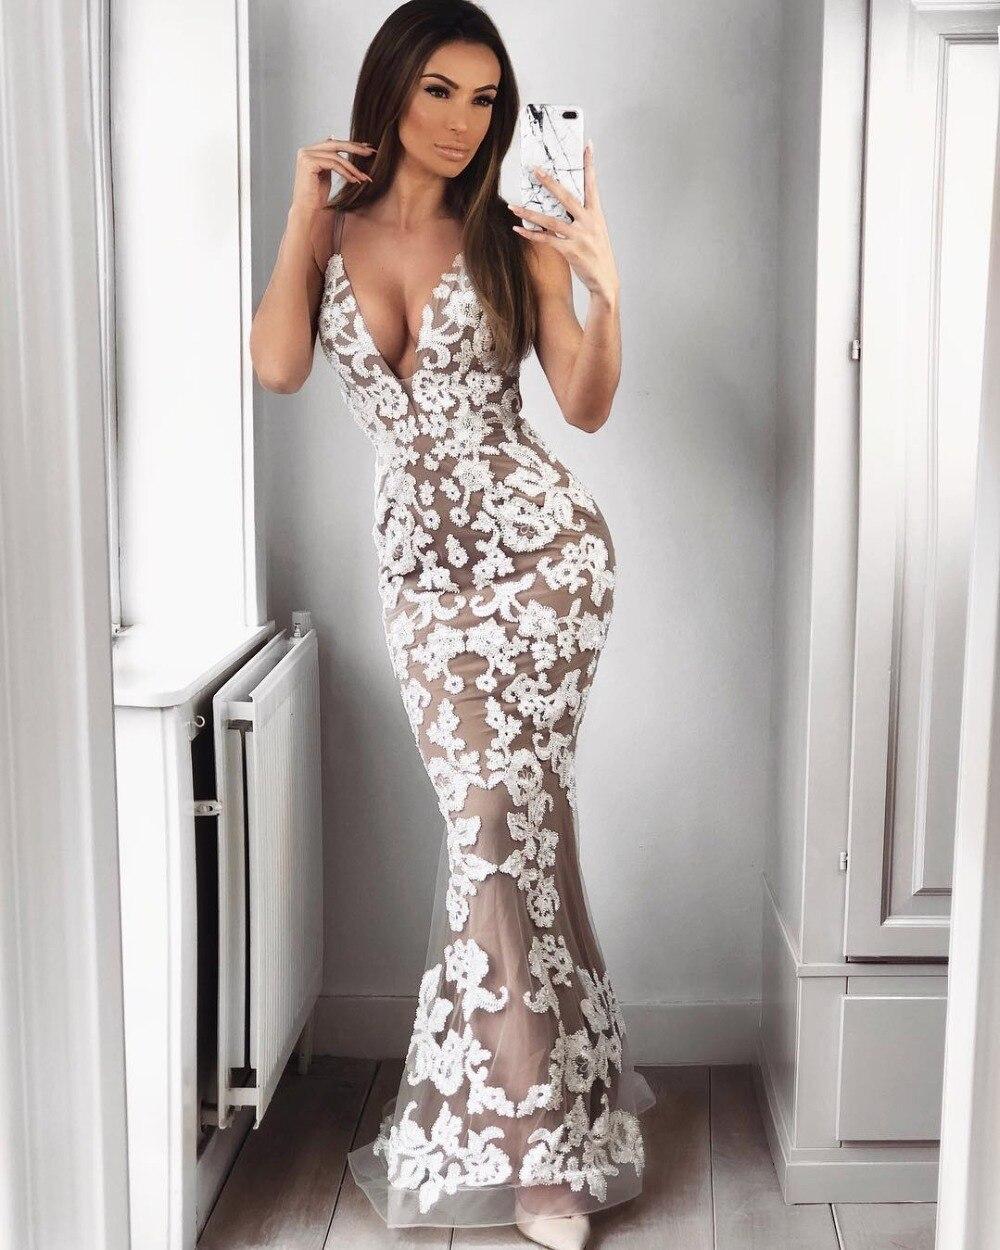 06e67ae01ca N24 2018 Qualité Dentelle En Élégant Femmes Robes Blanc Kaki Long V D été  Top Parti Sexy Spaghetti Backless Col Maxi ...